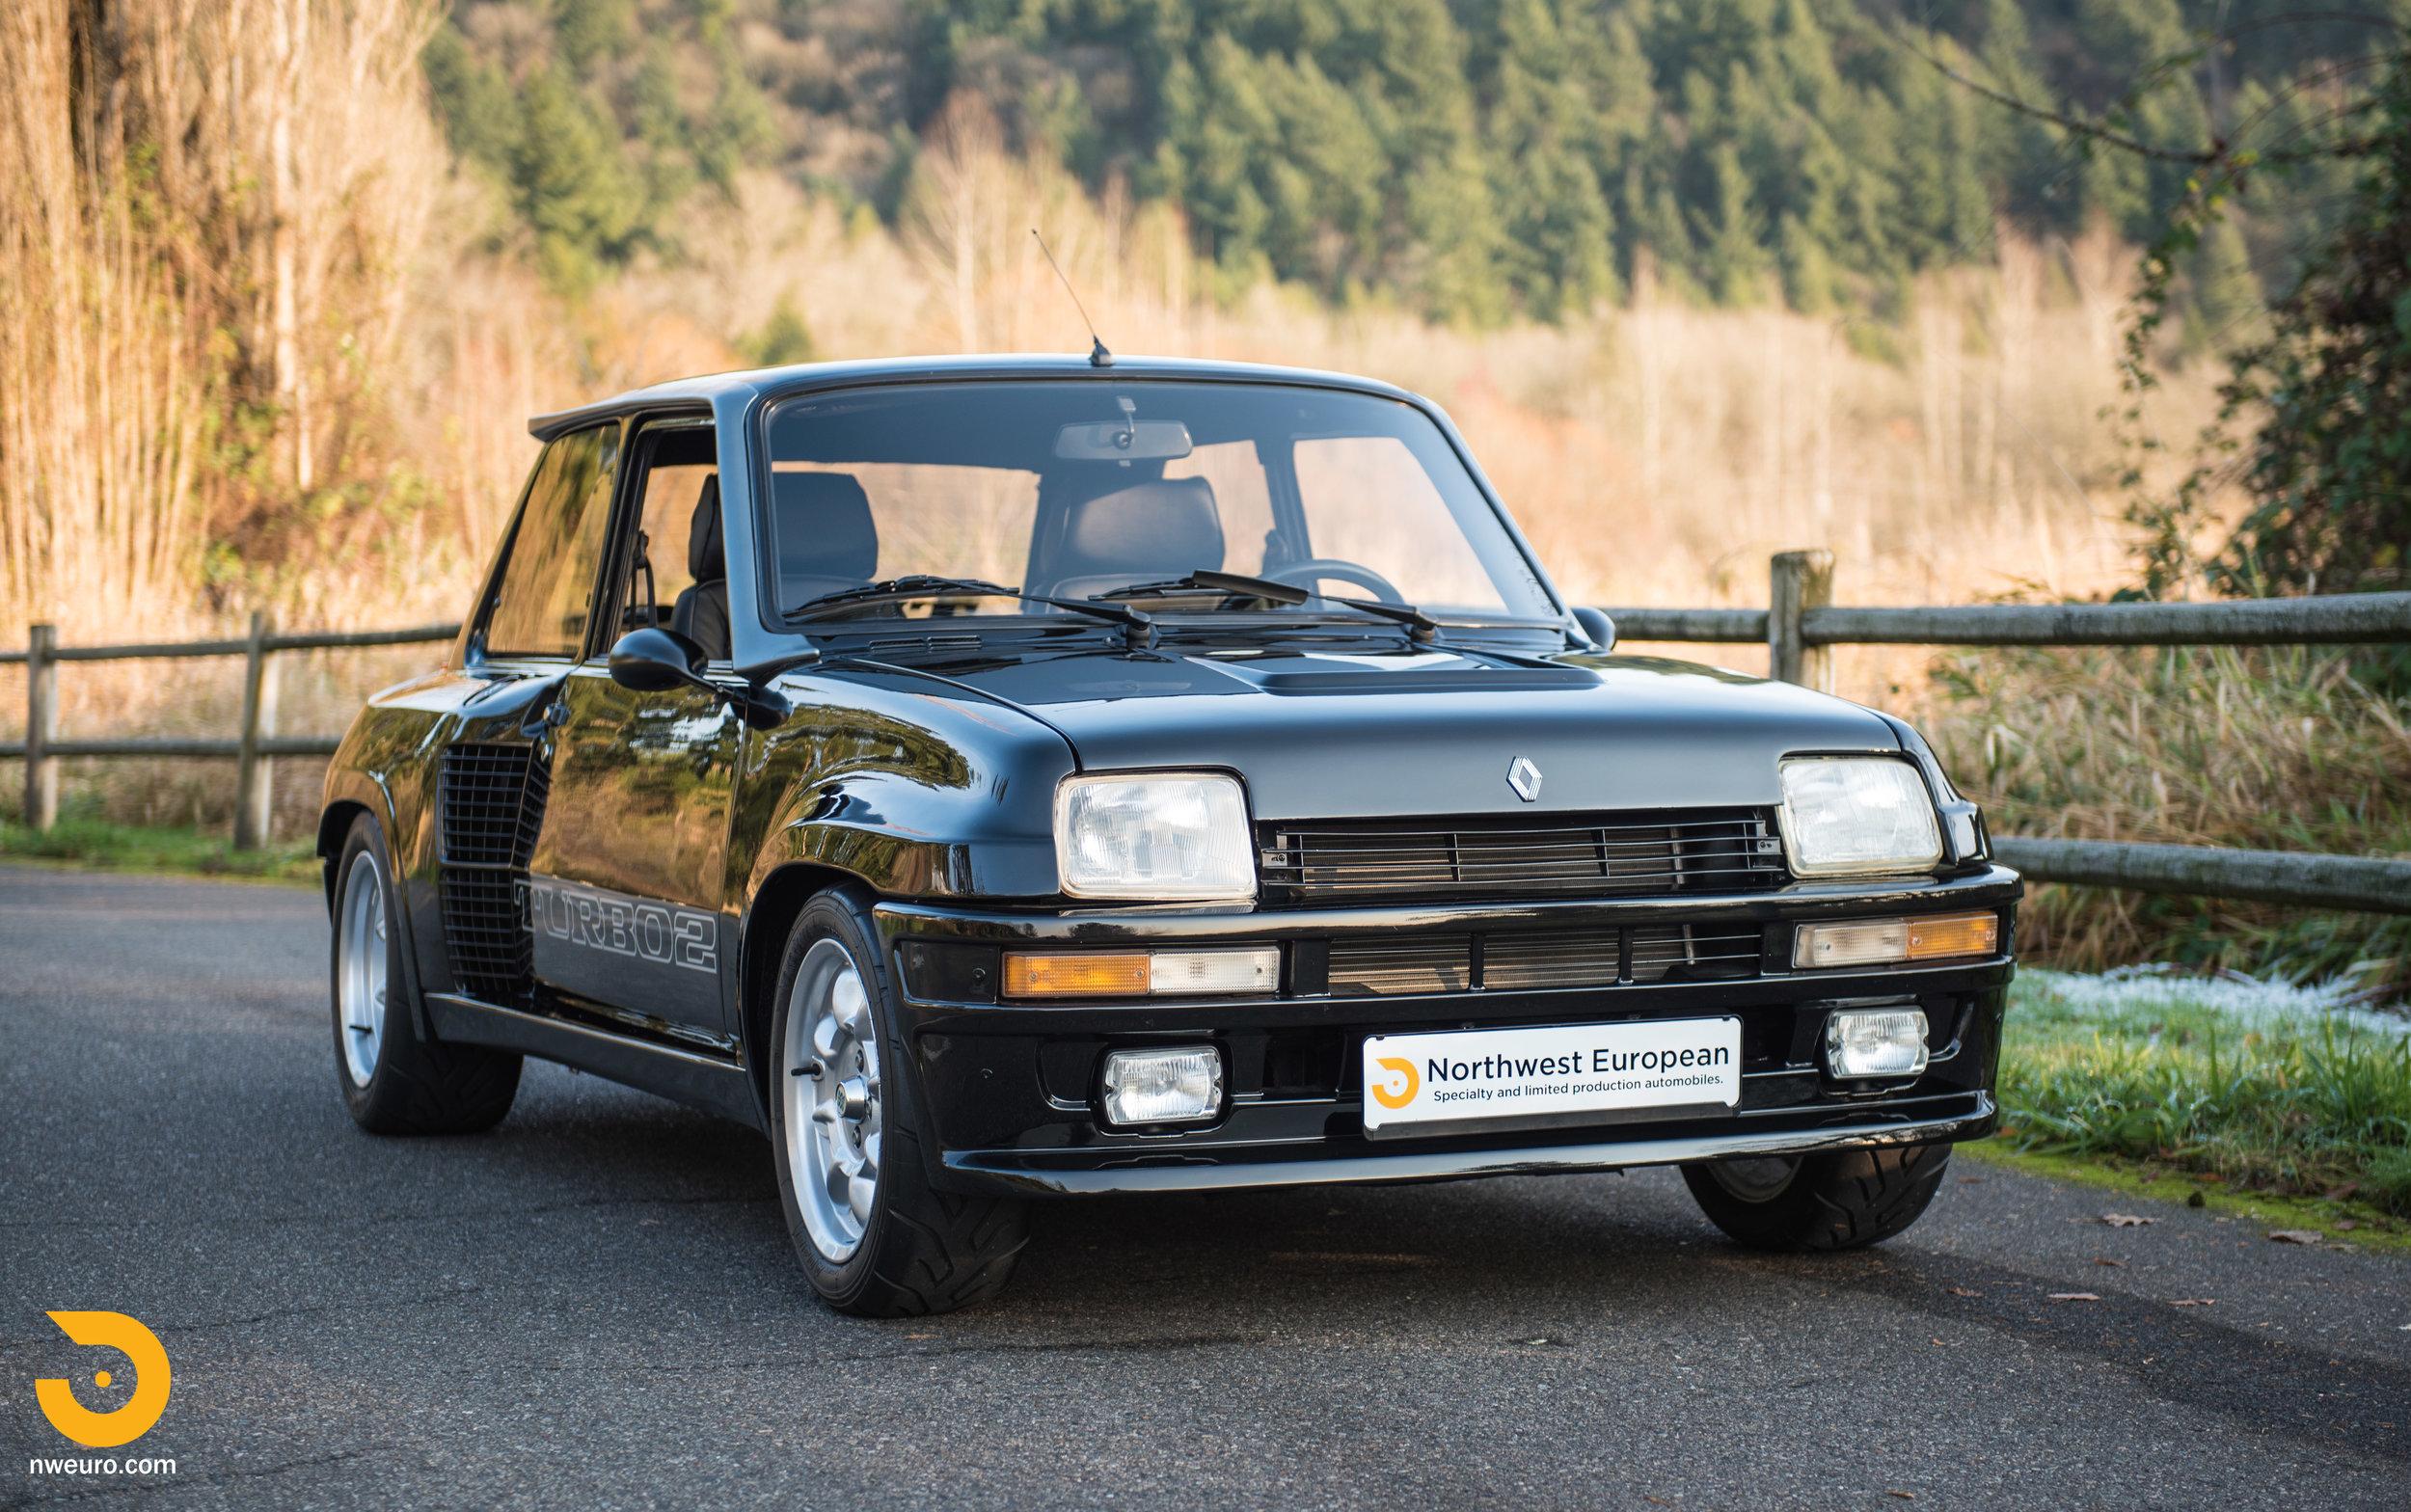 1983 Renault R5 Turbo 2 Black at Park-5.jpg